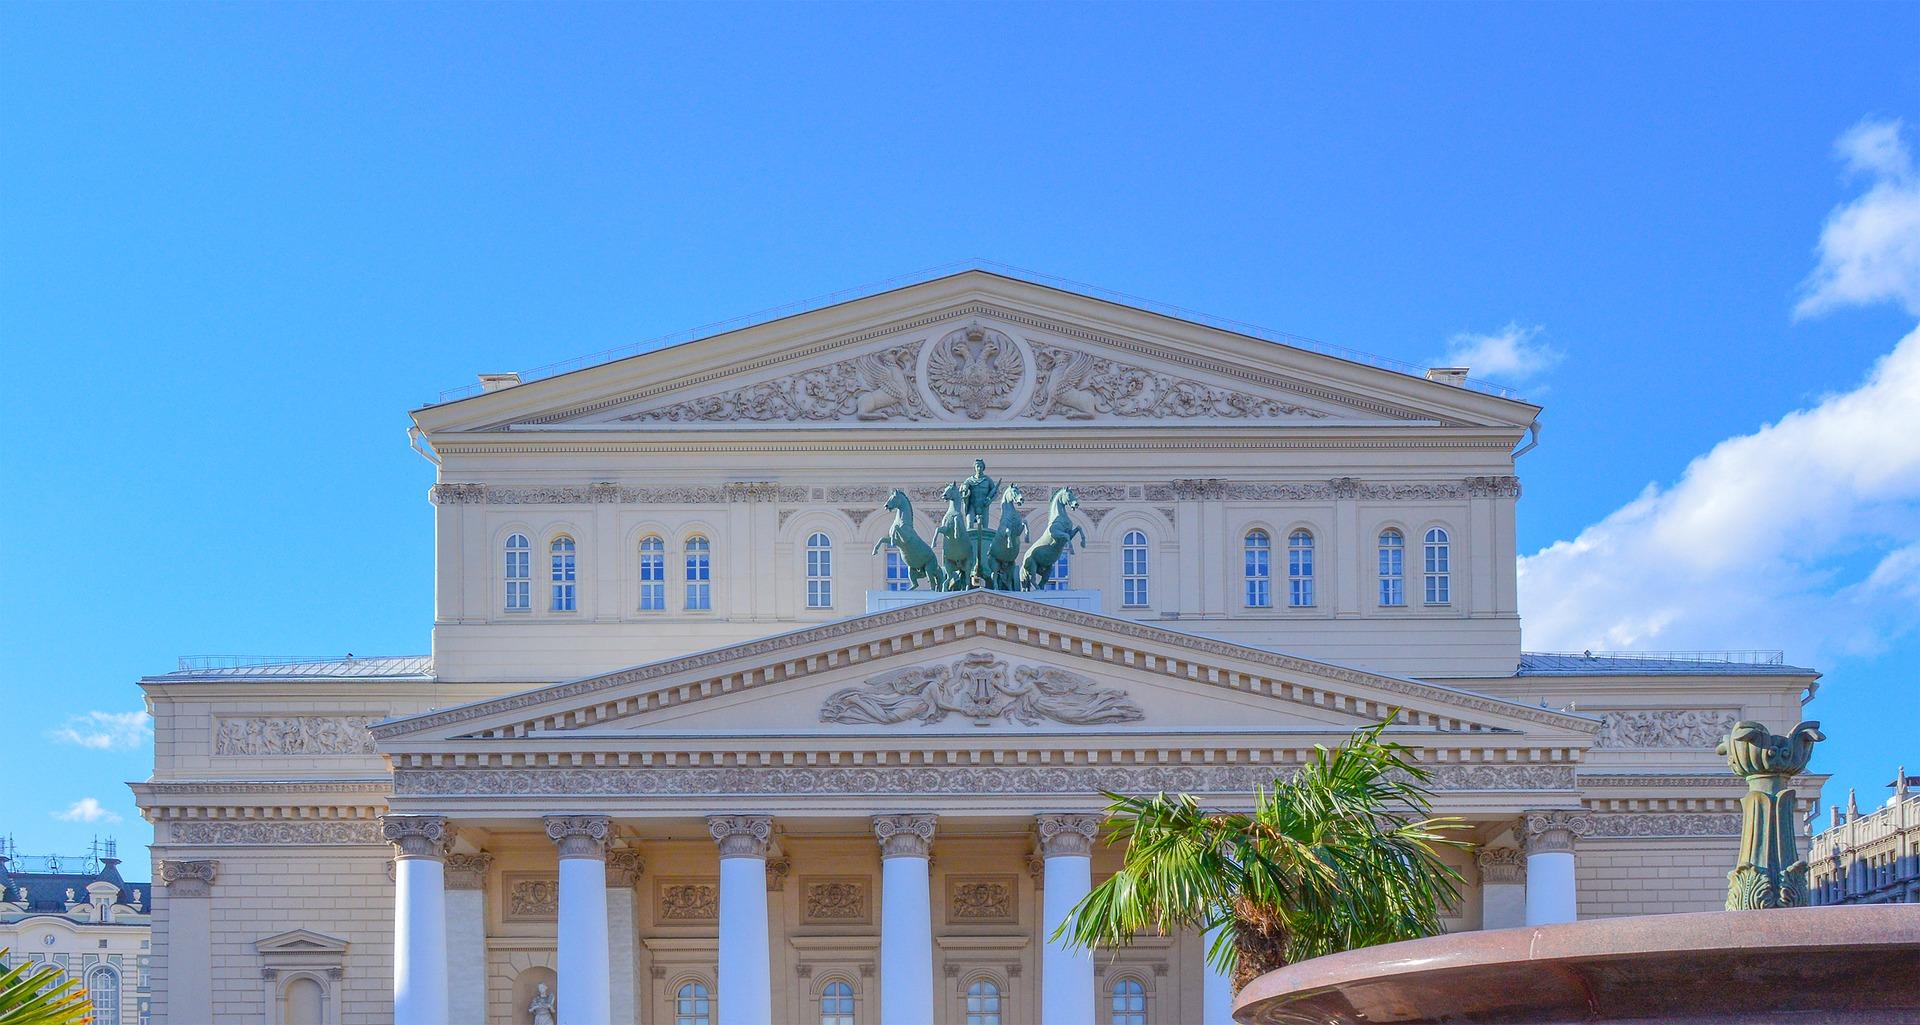 bolshoi-theatre-1820498_1920